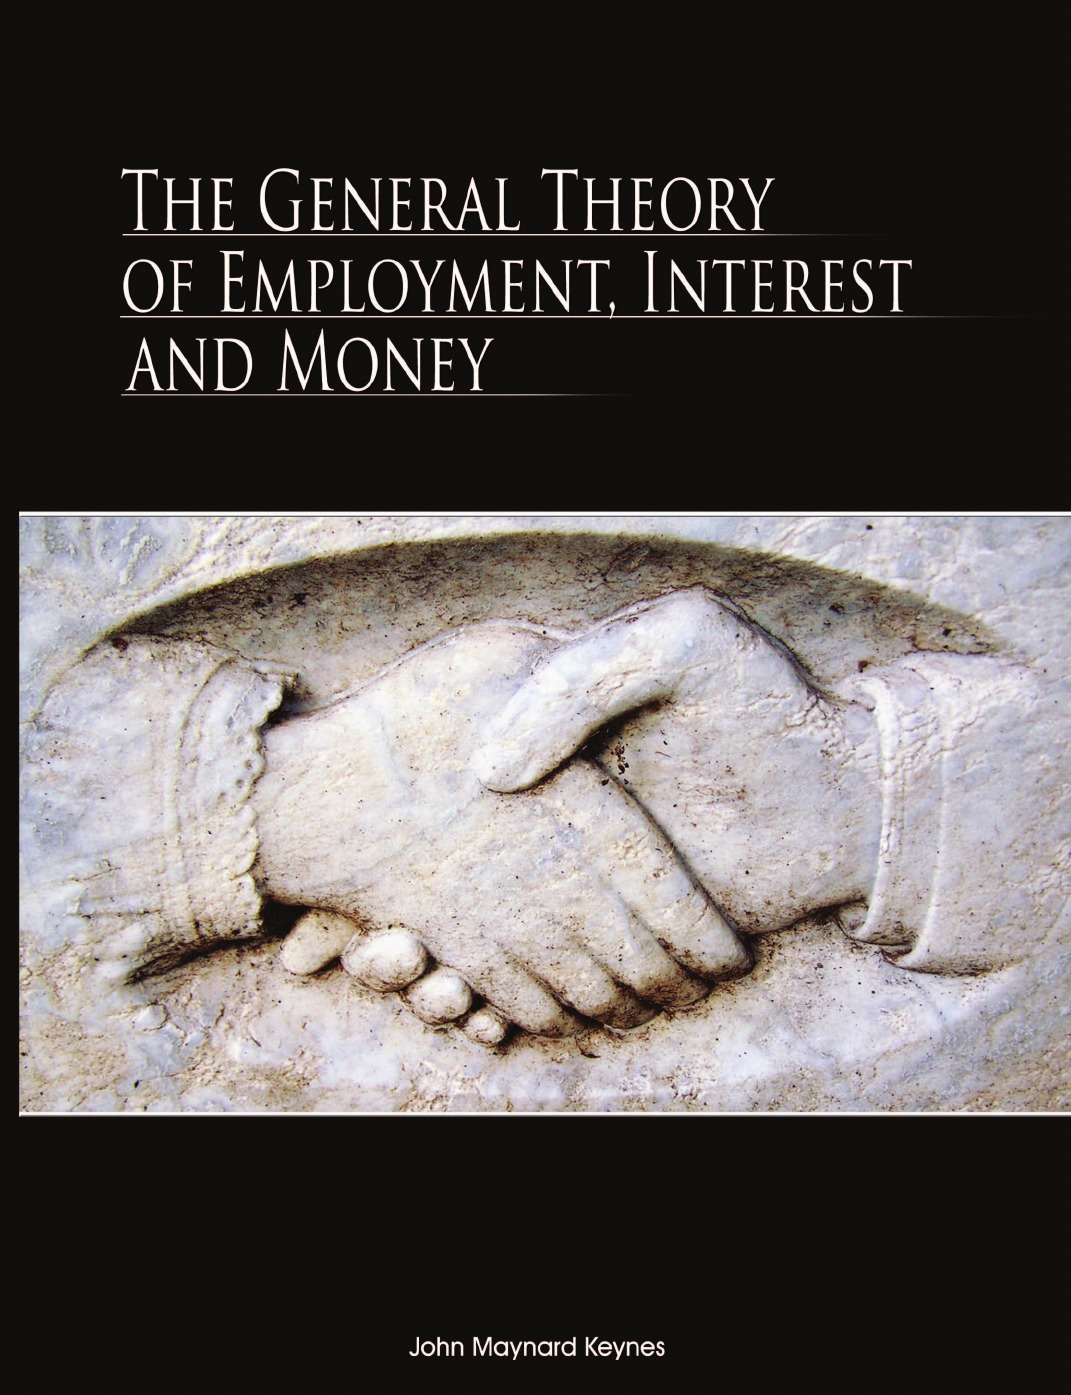 купить John Maynard Keynes The General Theory of Employment, Interest, and Money по цене 1020 рублей